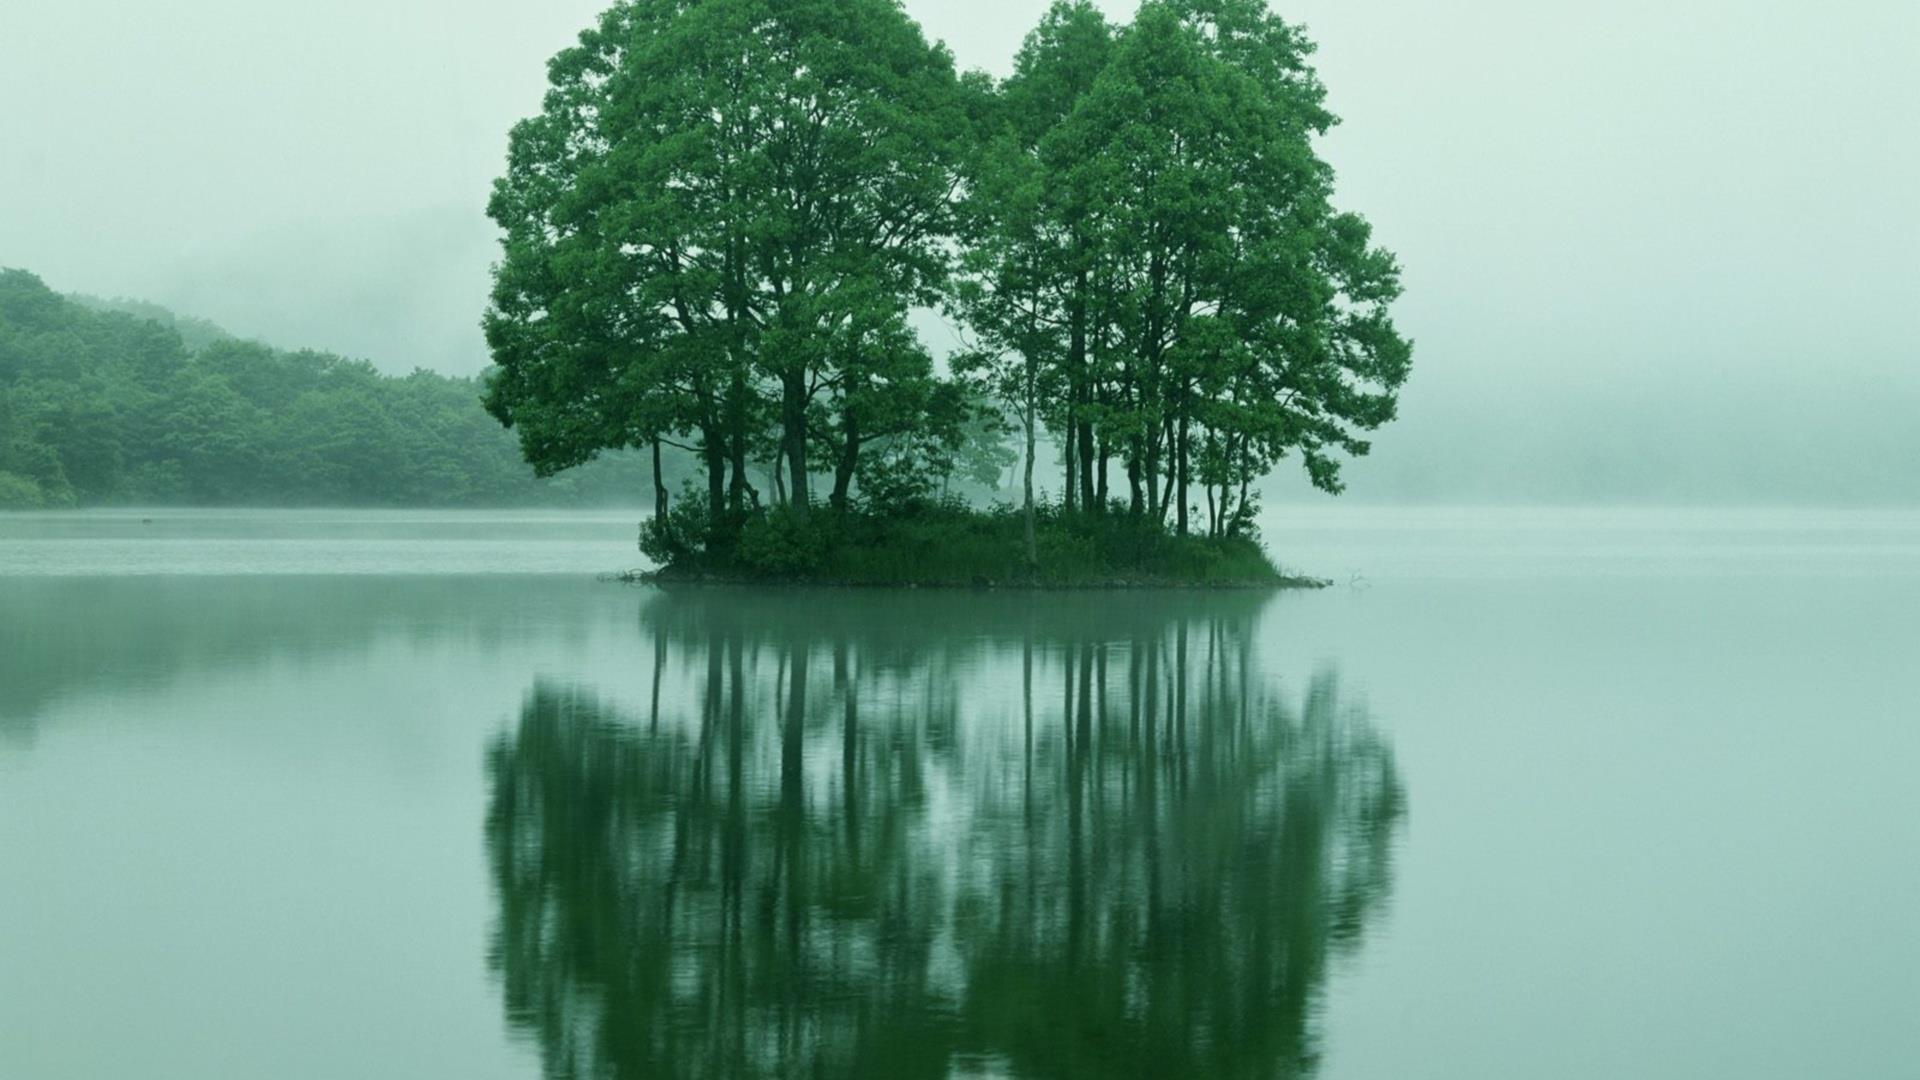 image-et-fonds-ecran-widescreen-arbres-telechargement-gratuit-2